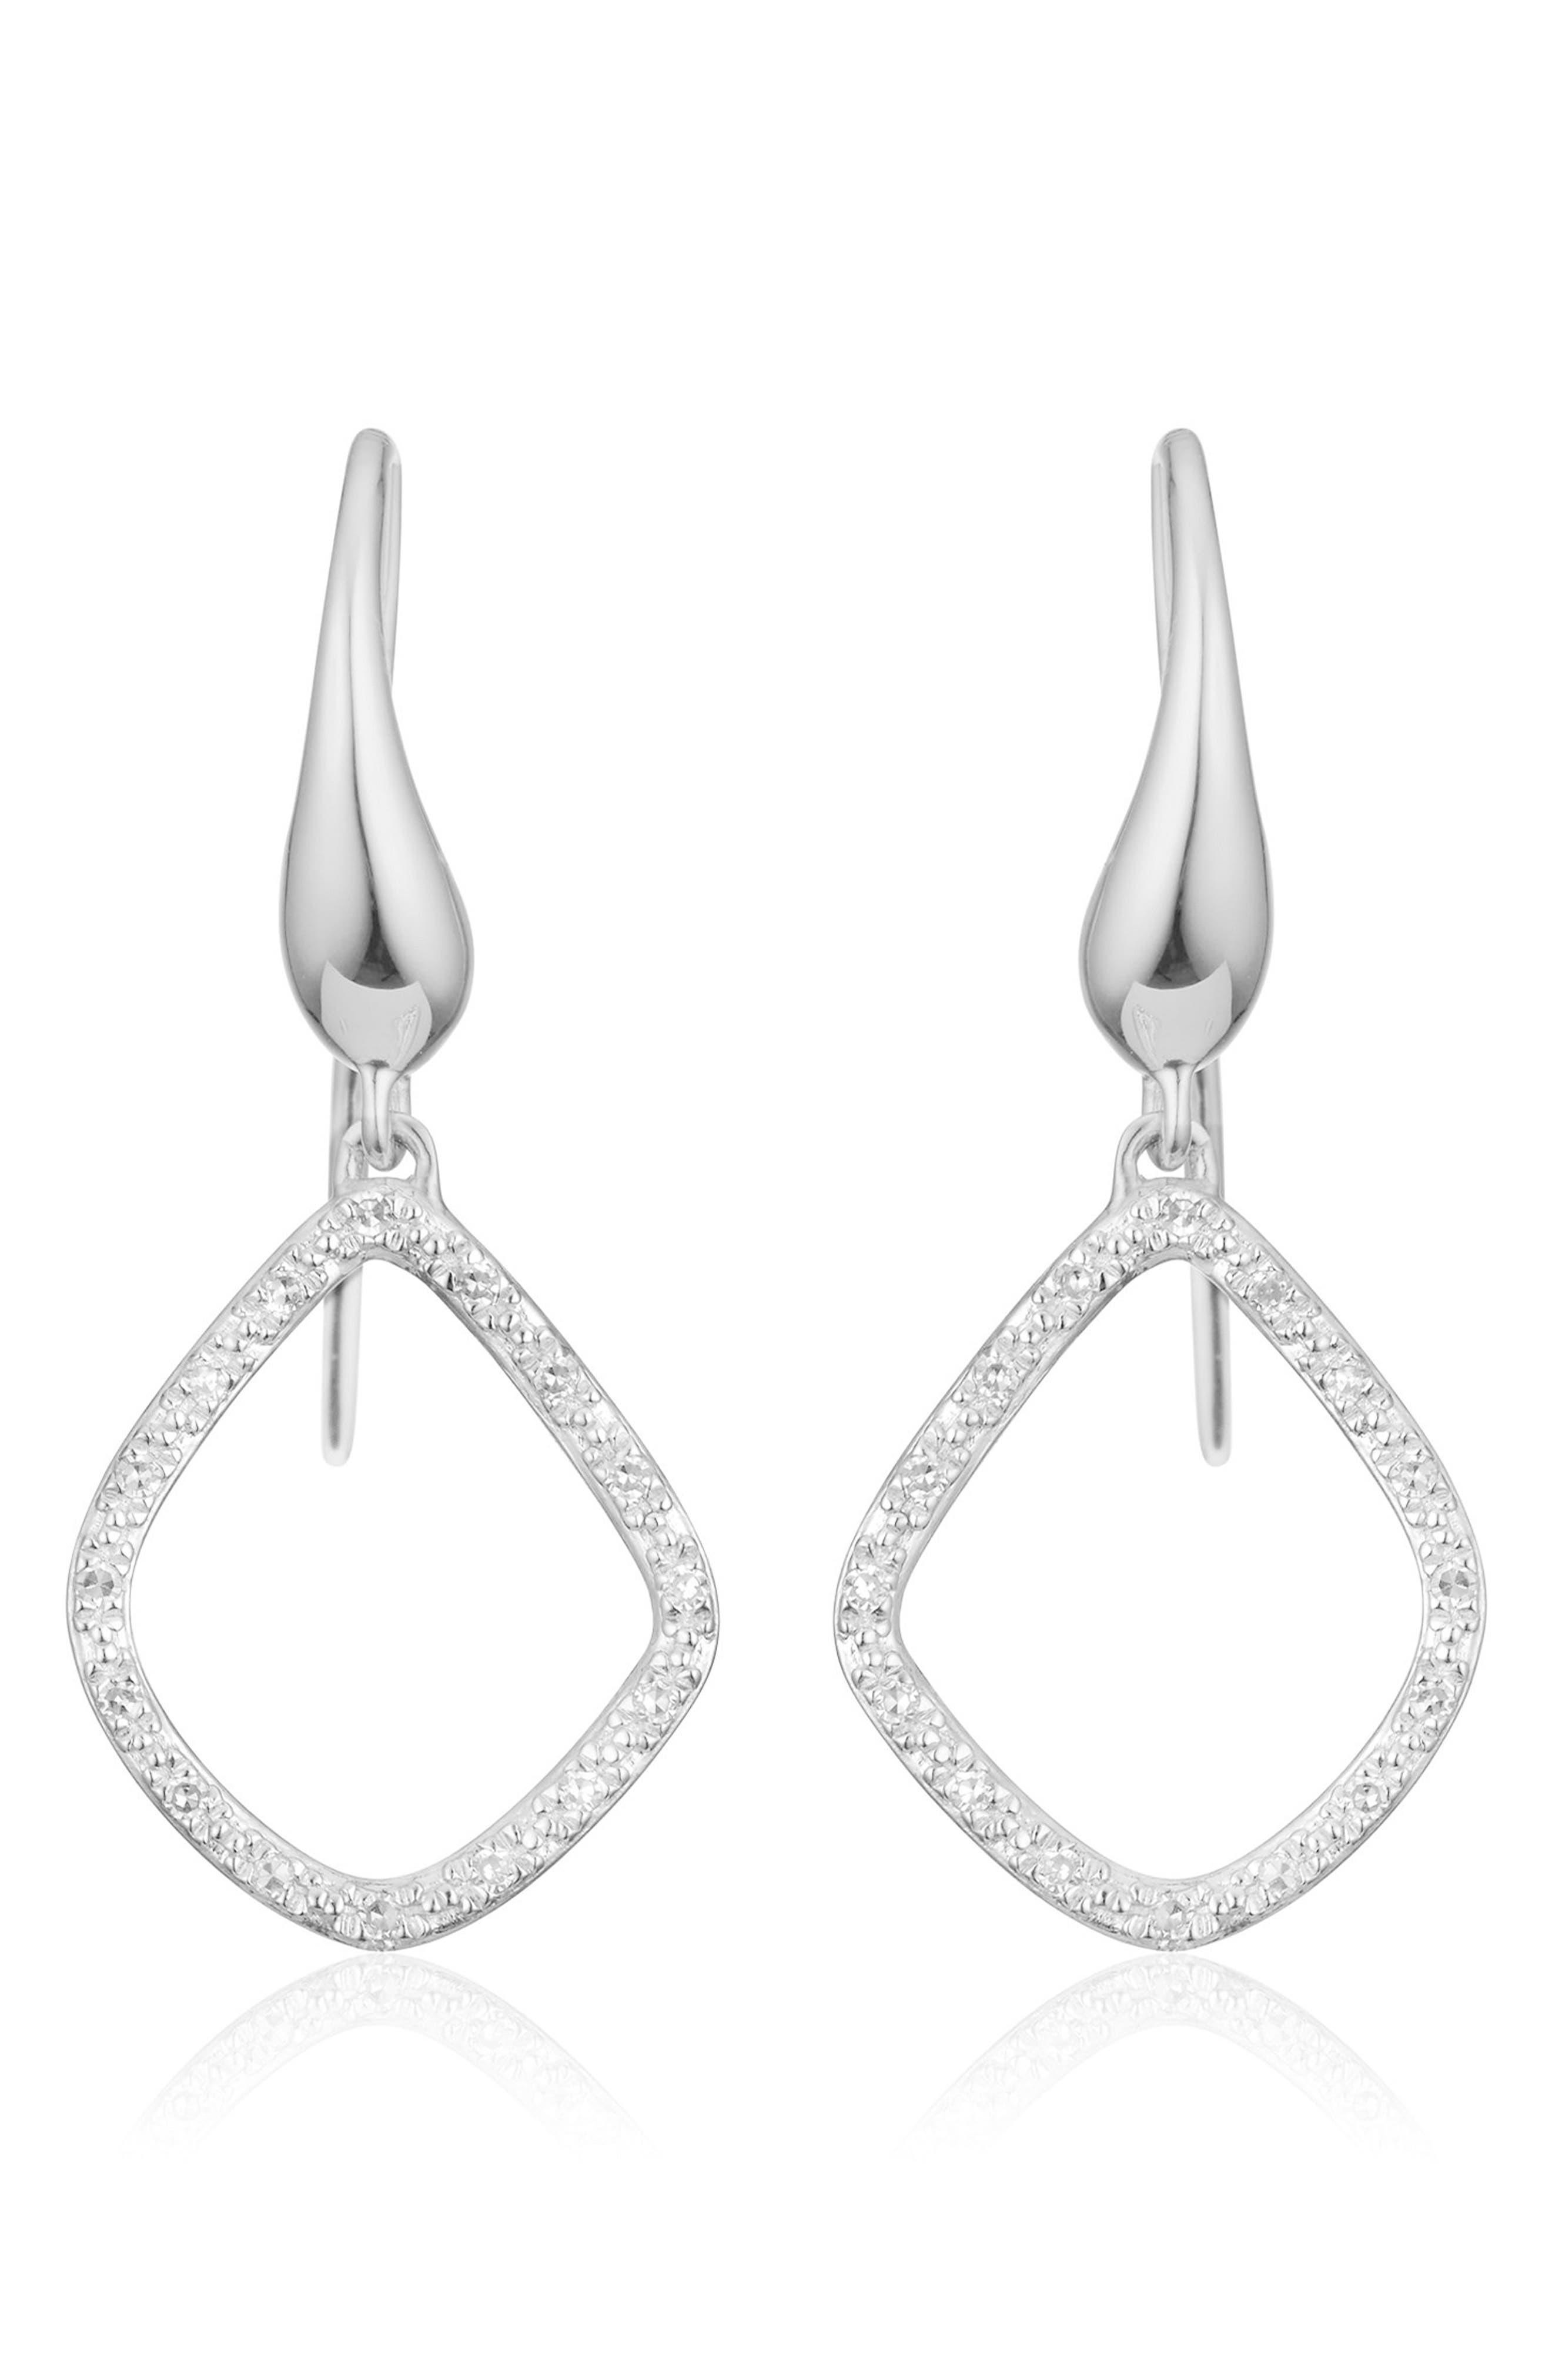 'Riva Kite' Diamond Drop Earrings,                             Main thumbnail 1, color,                             SILVER